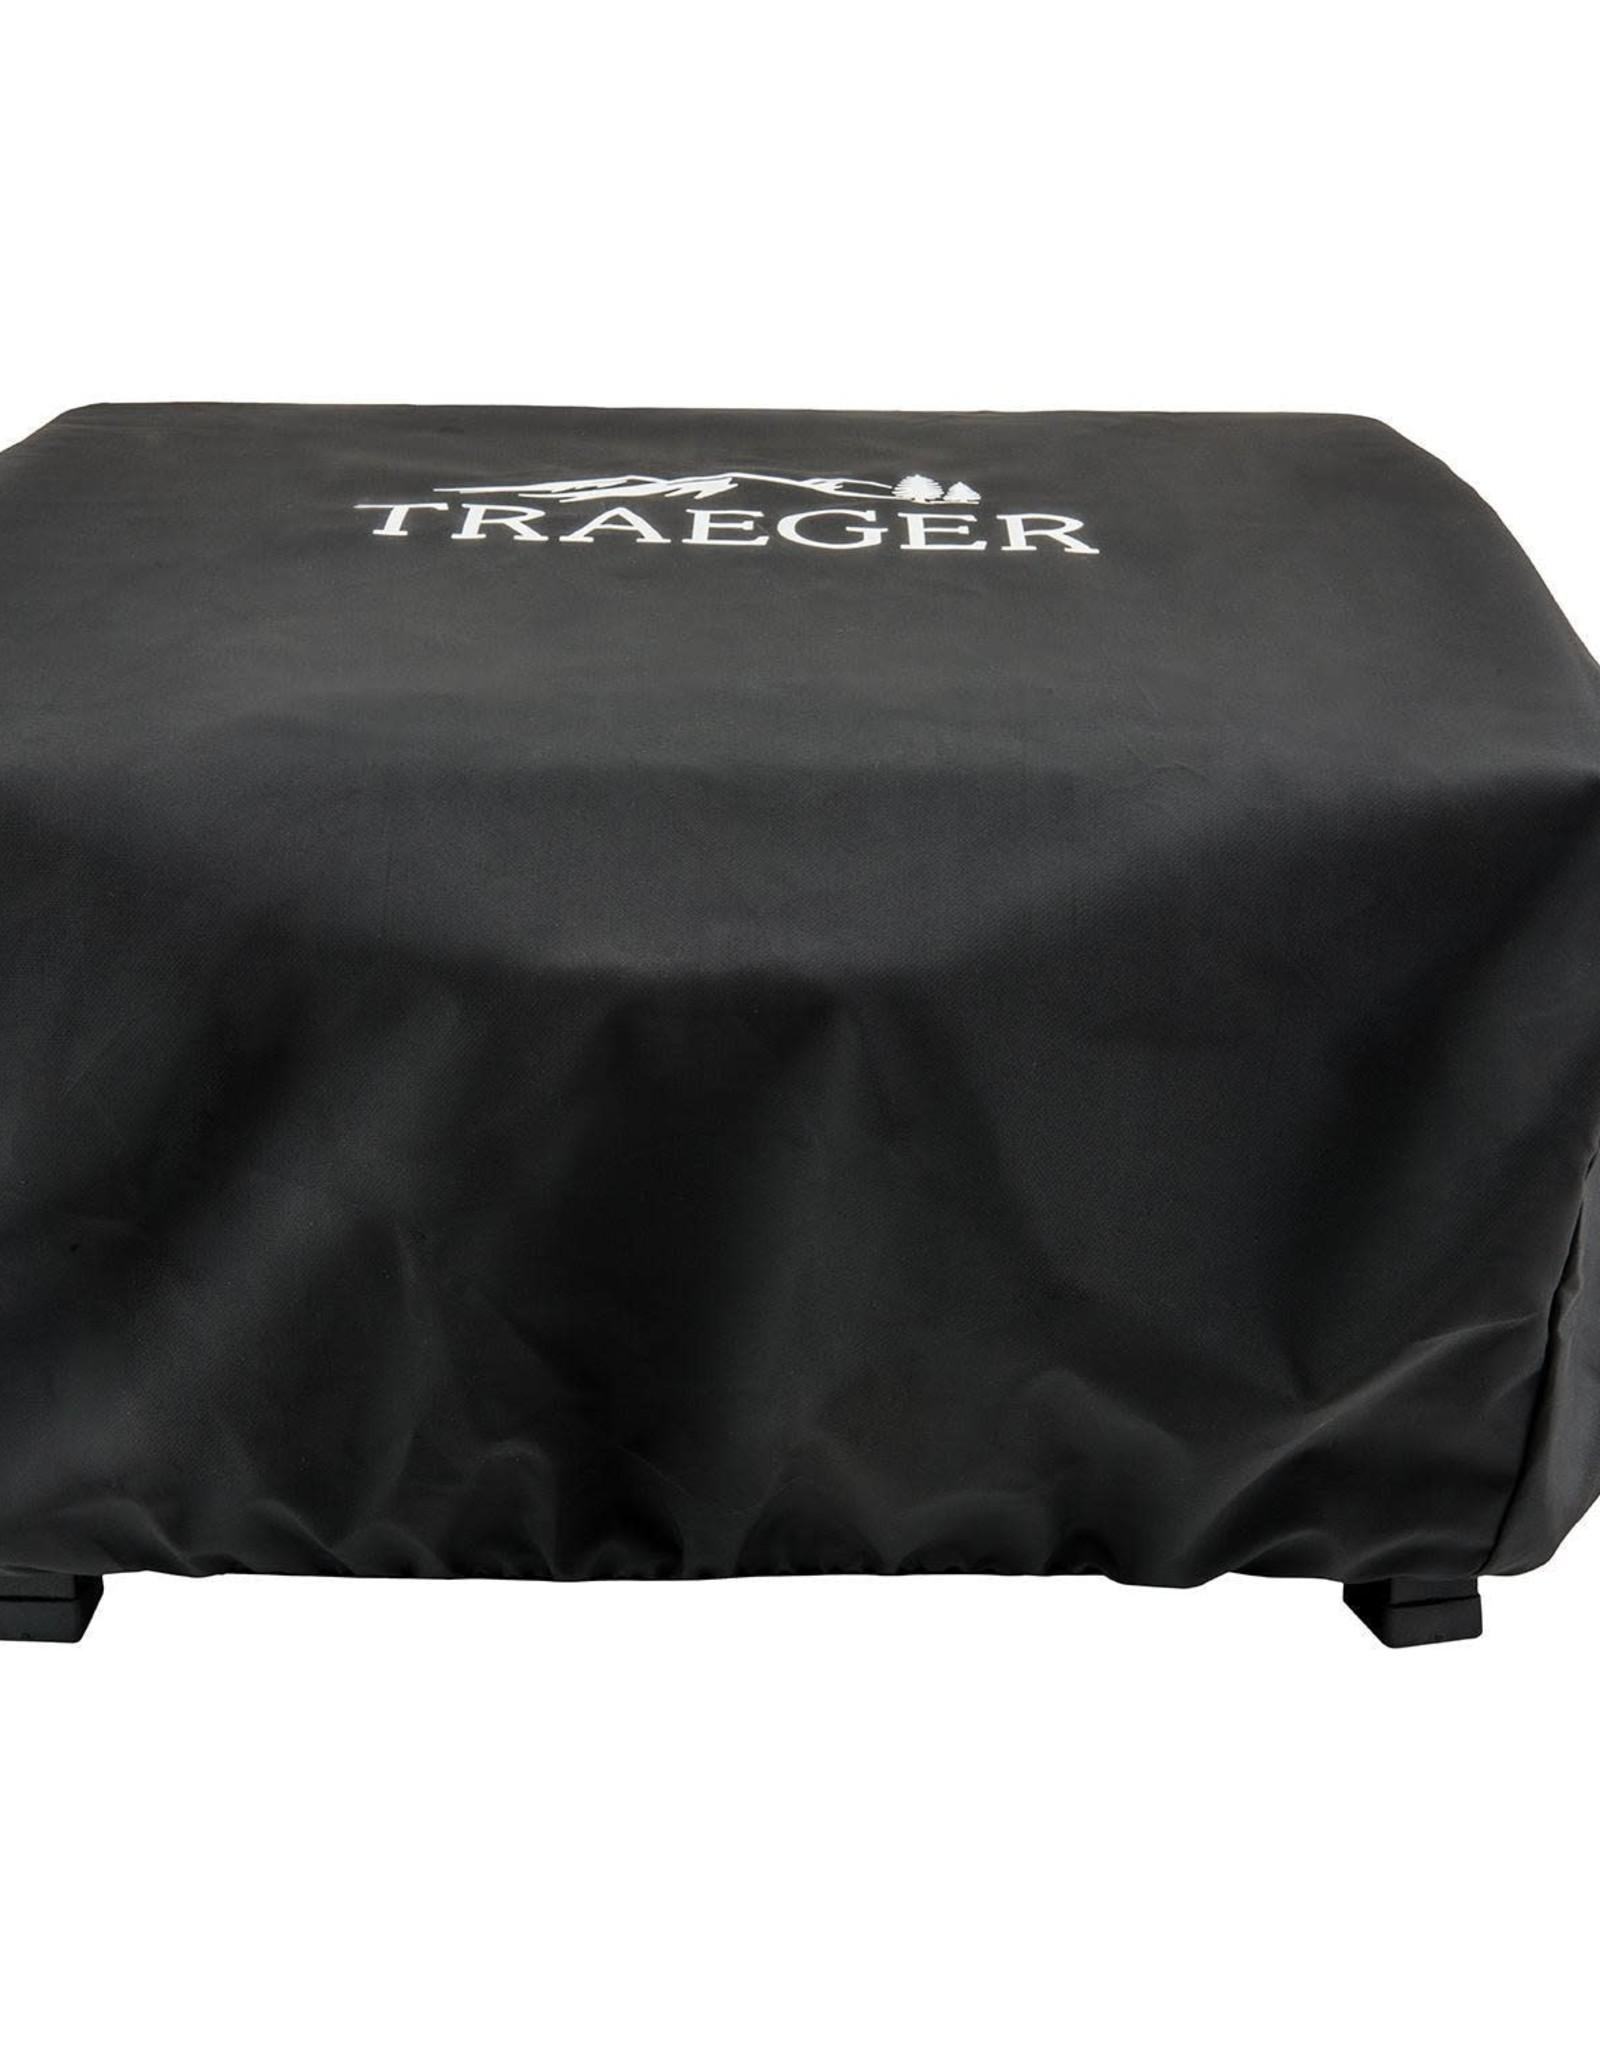 Traeger Traeger Full Length Grill Cover For Scout & Ranger - BAC475